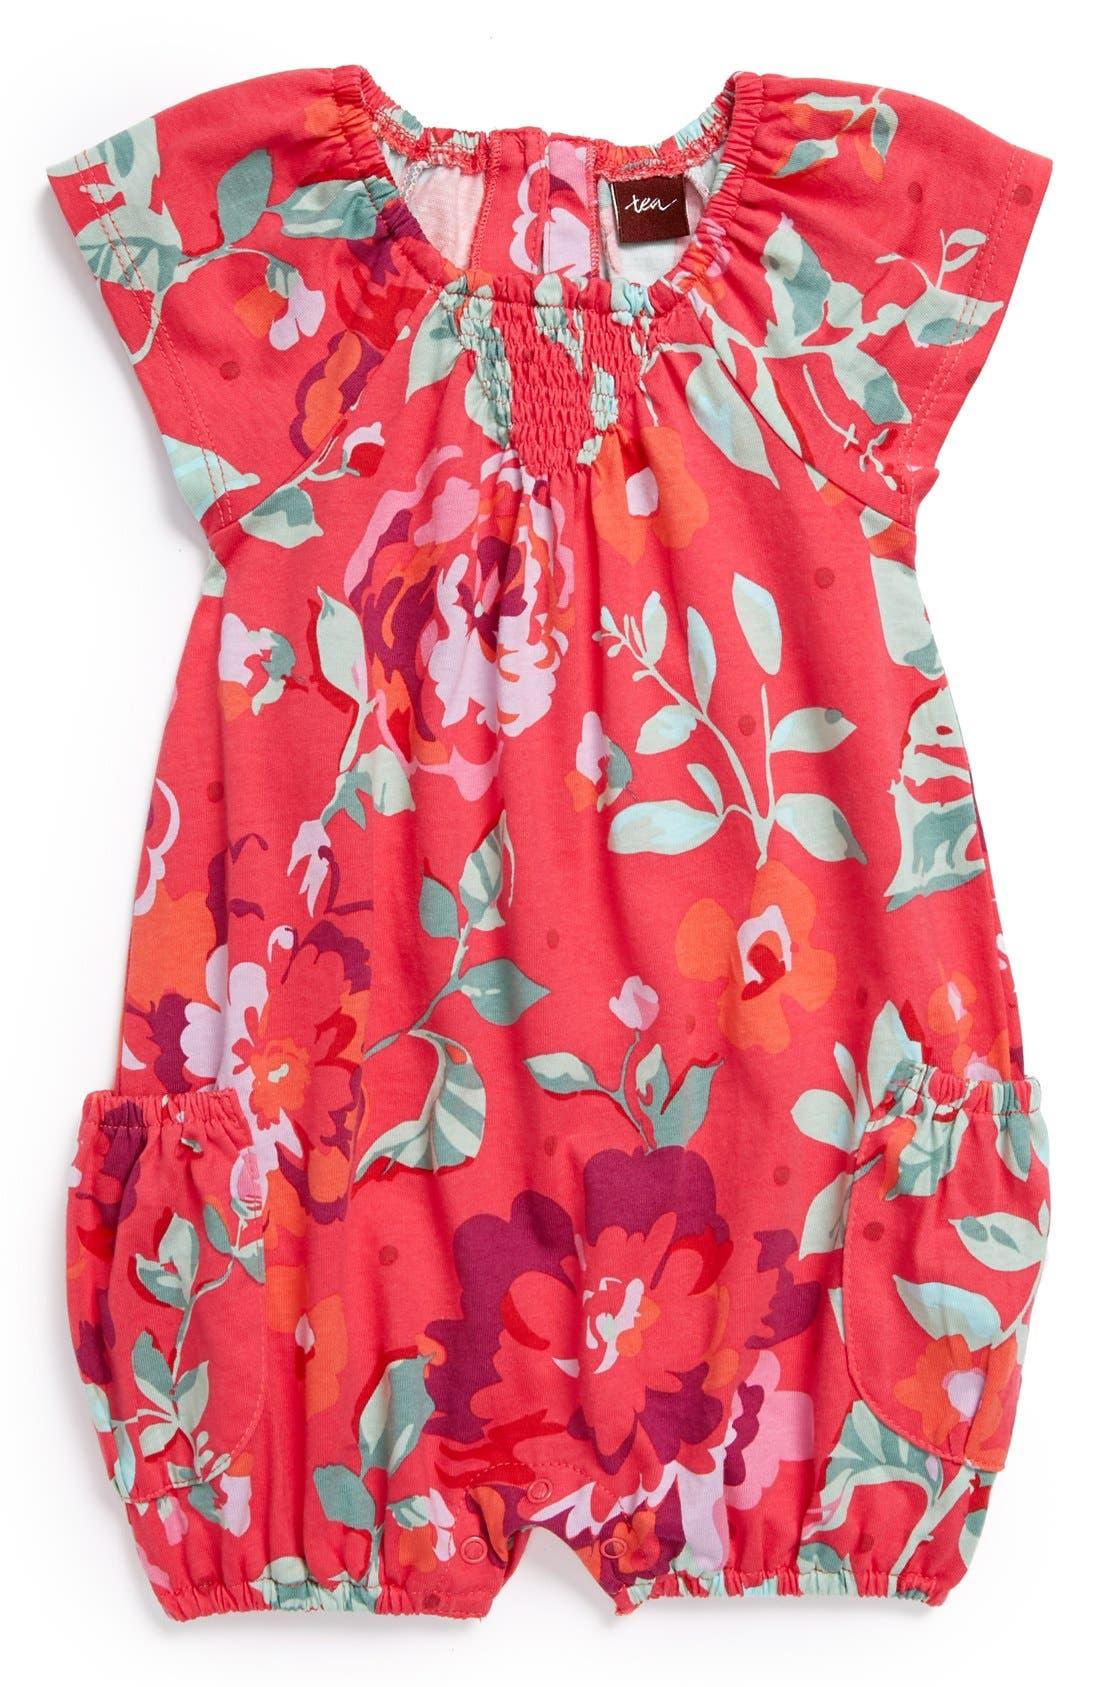 Alternate Image 1 Selected - Tea Collection 'Desert Rose' Bubble Romper (Baby Girls)